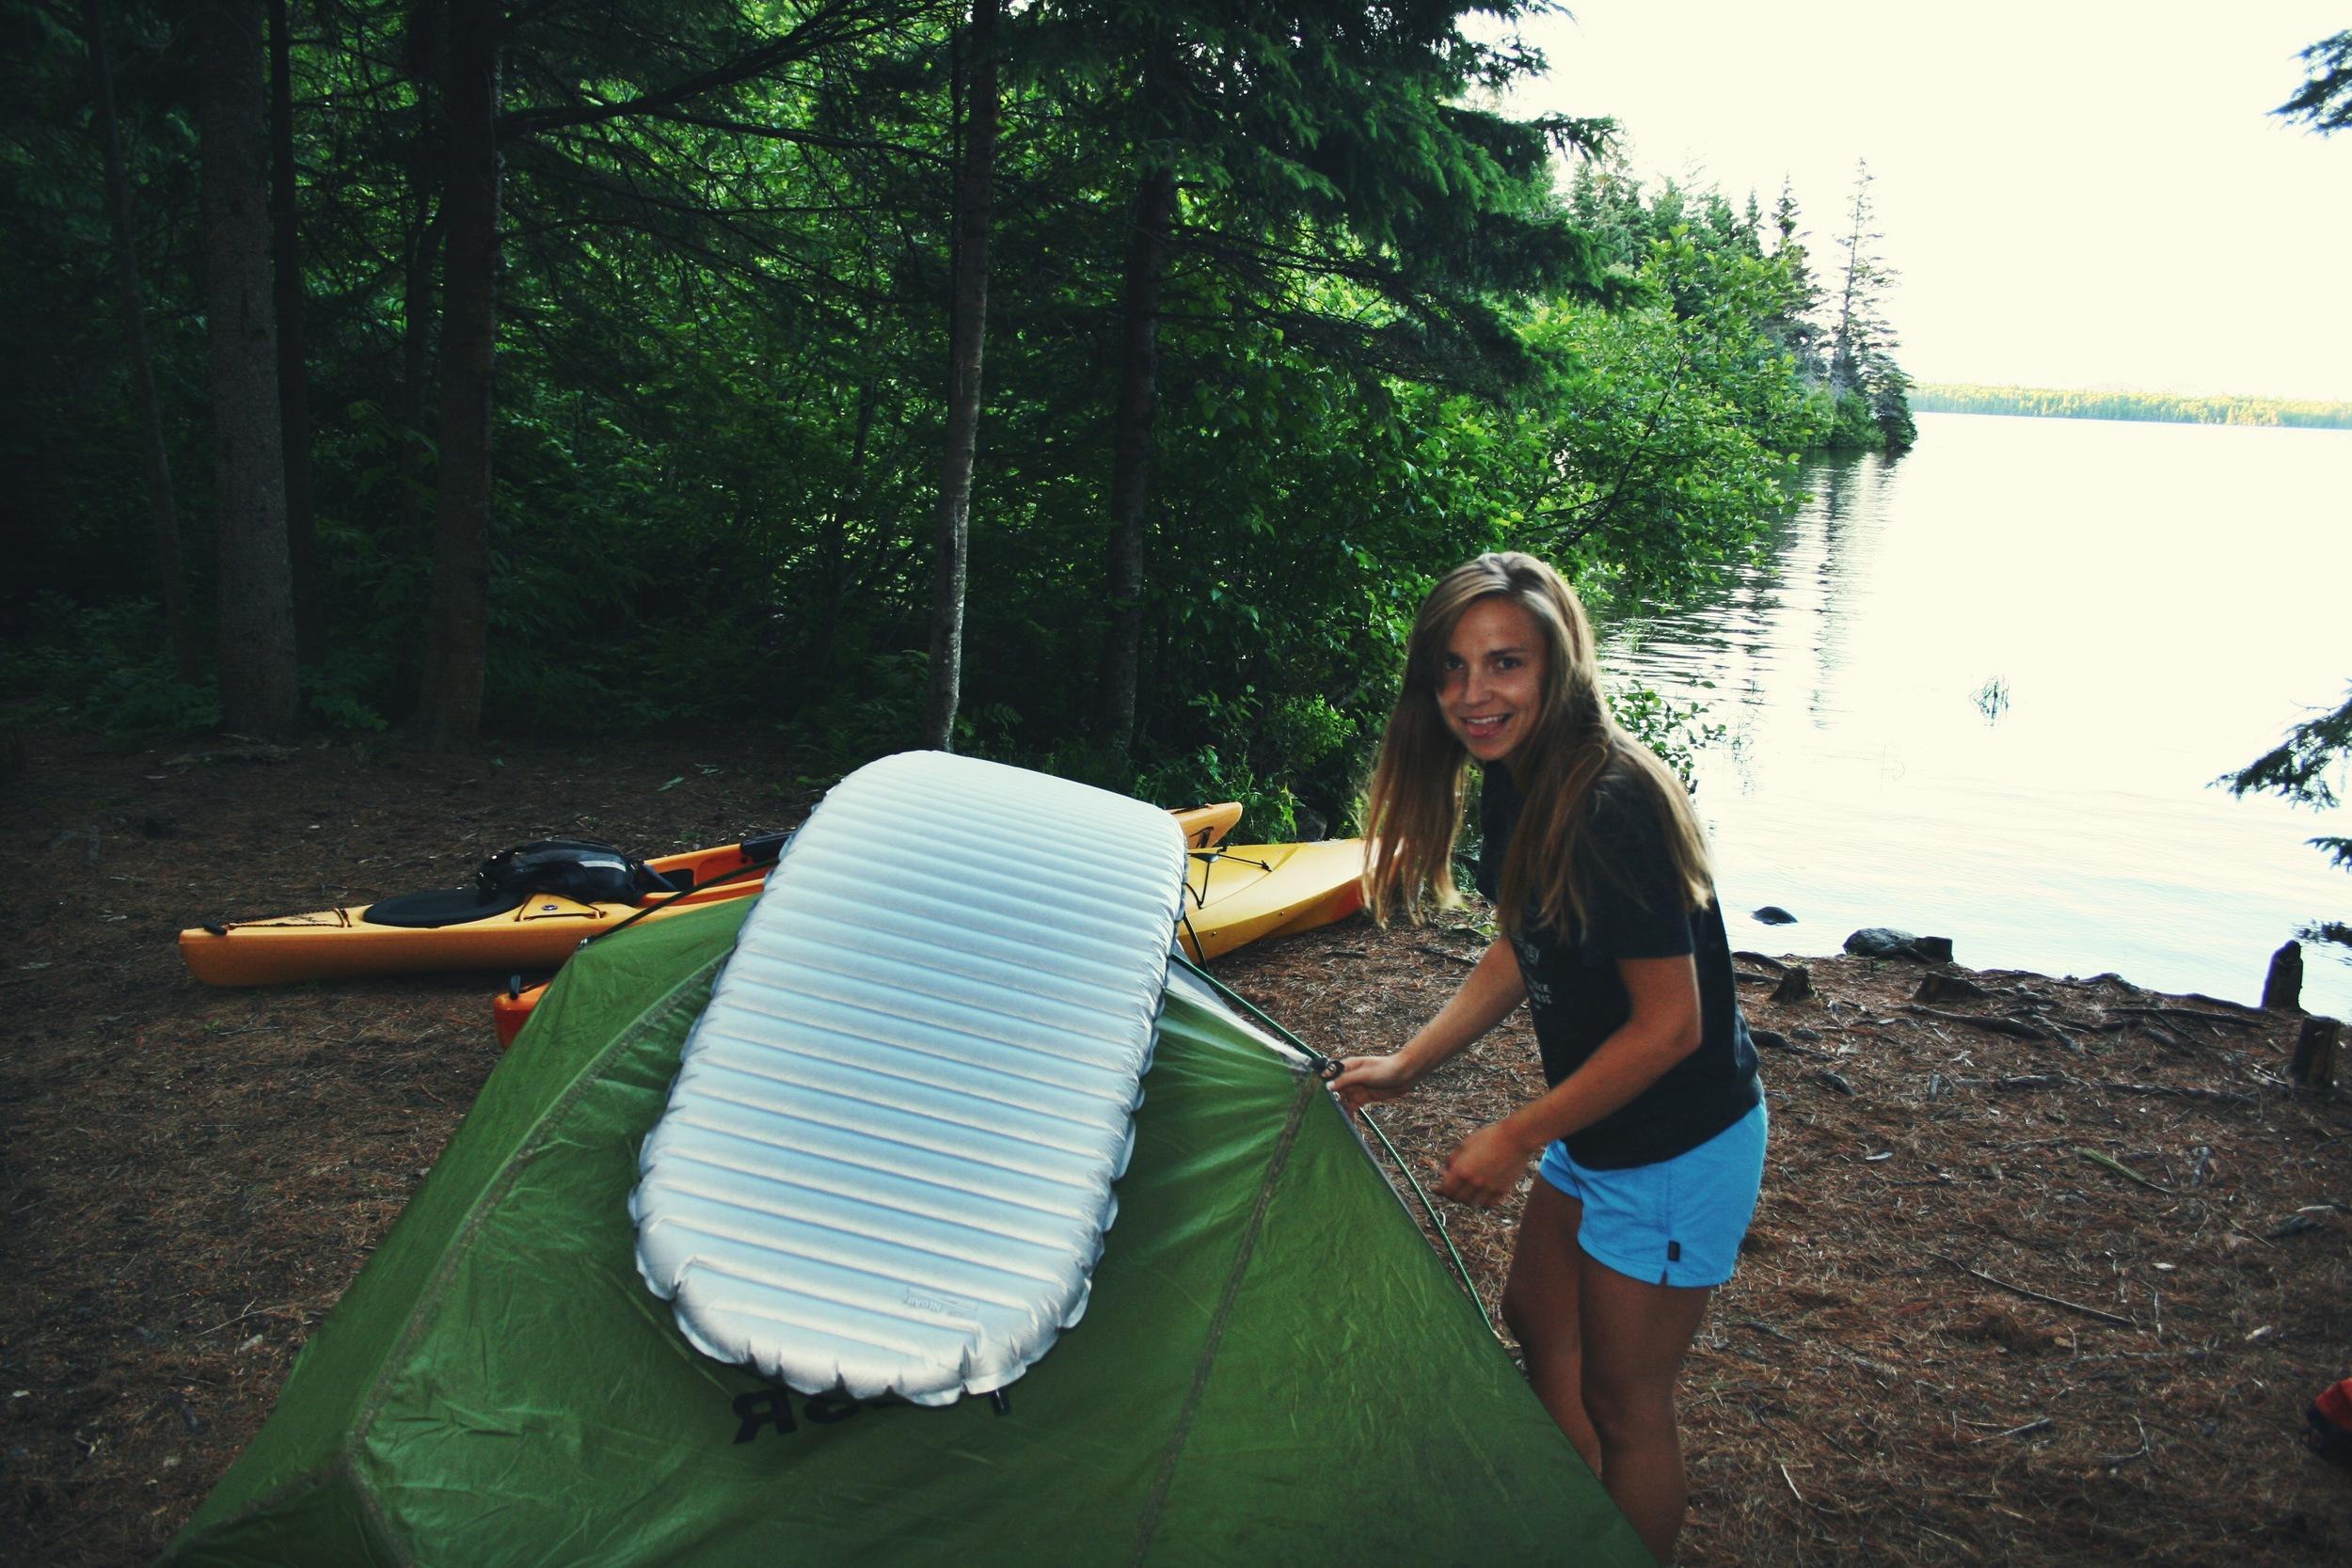 Moose getting camp set up.